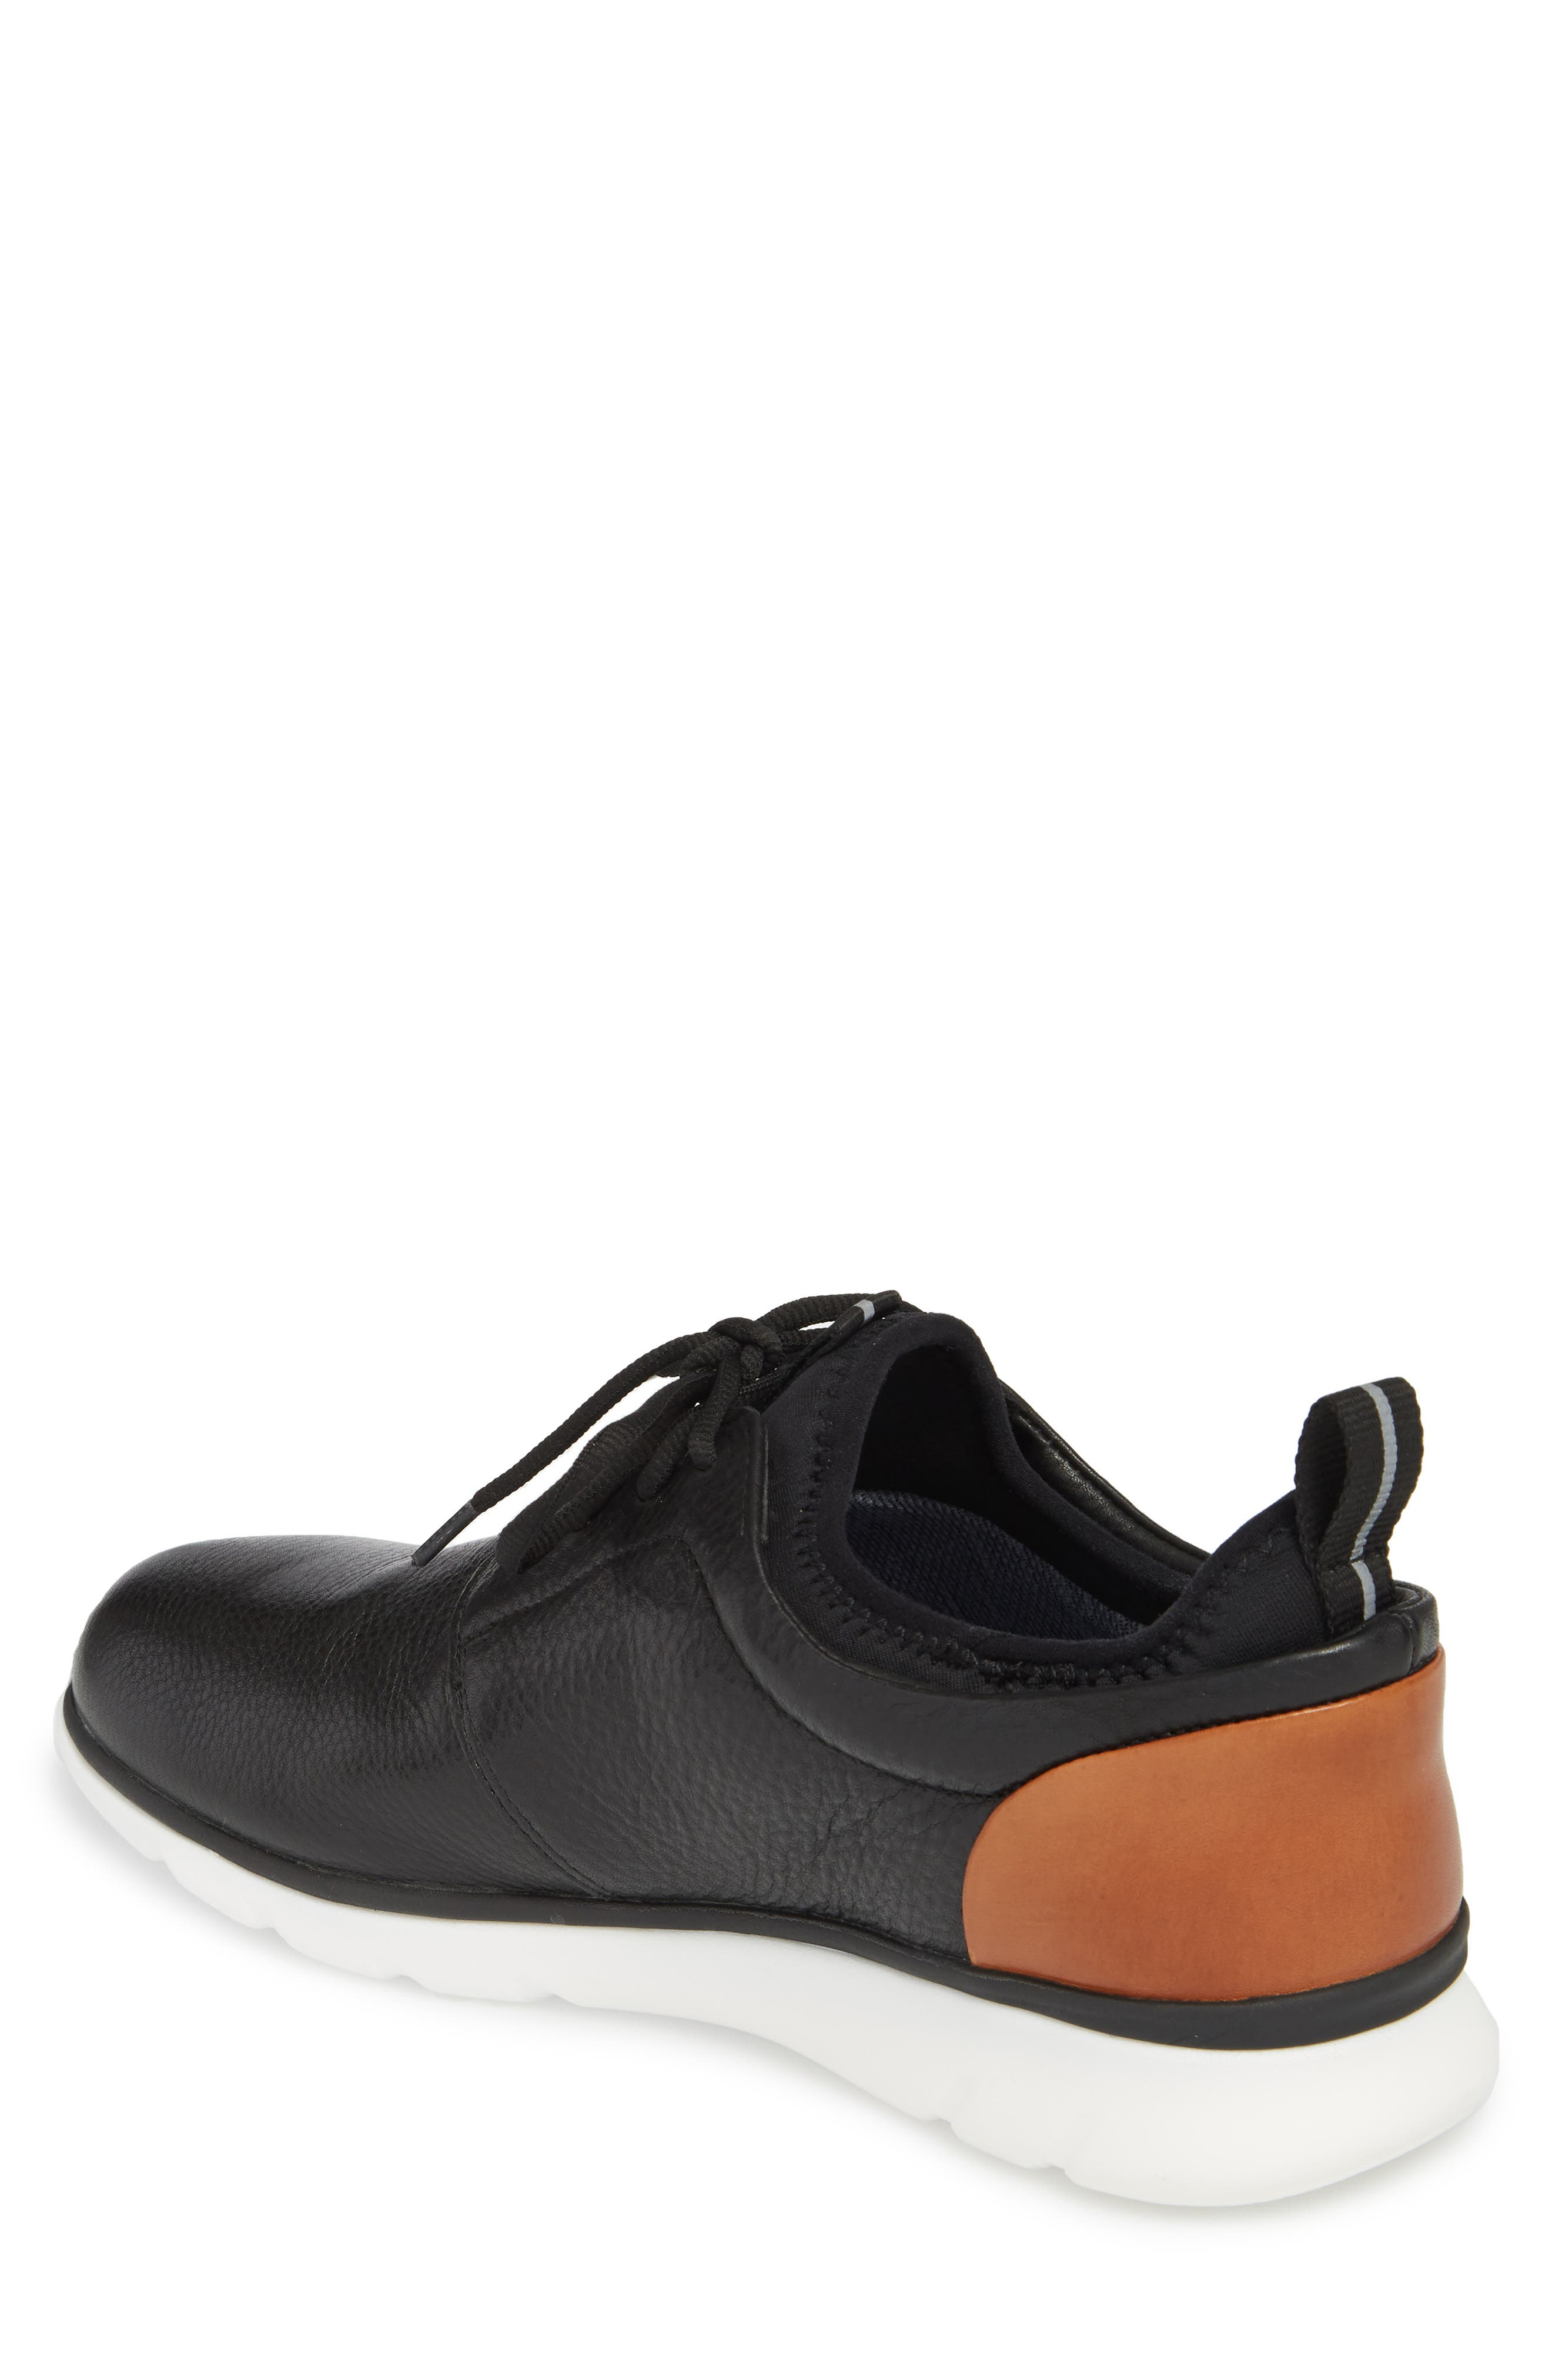 Alternate Image 2  - Johnston & Murphy Prentiss XC4® Waterproof Low Top Sneaker (Men)